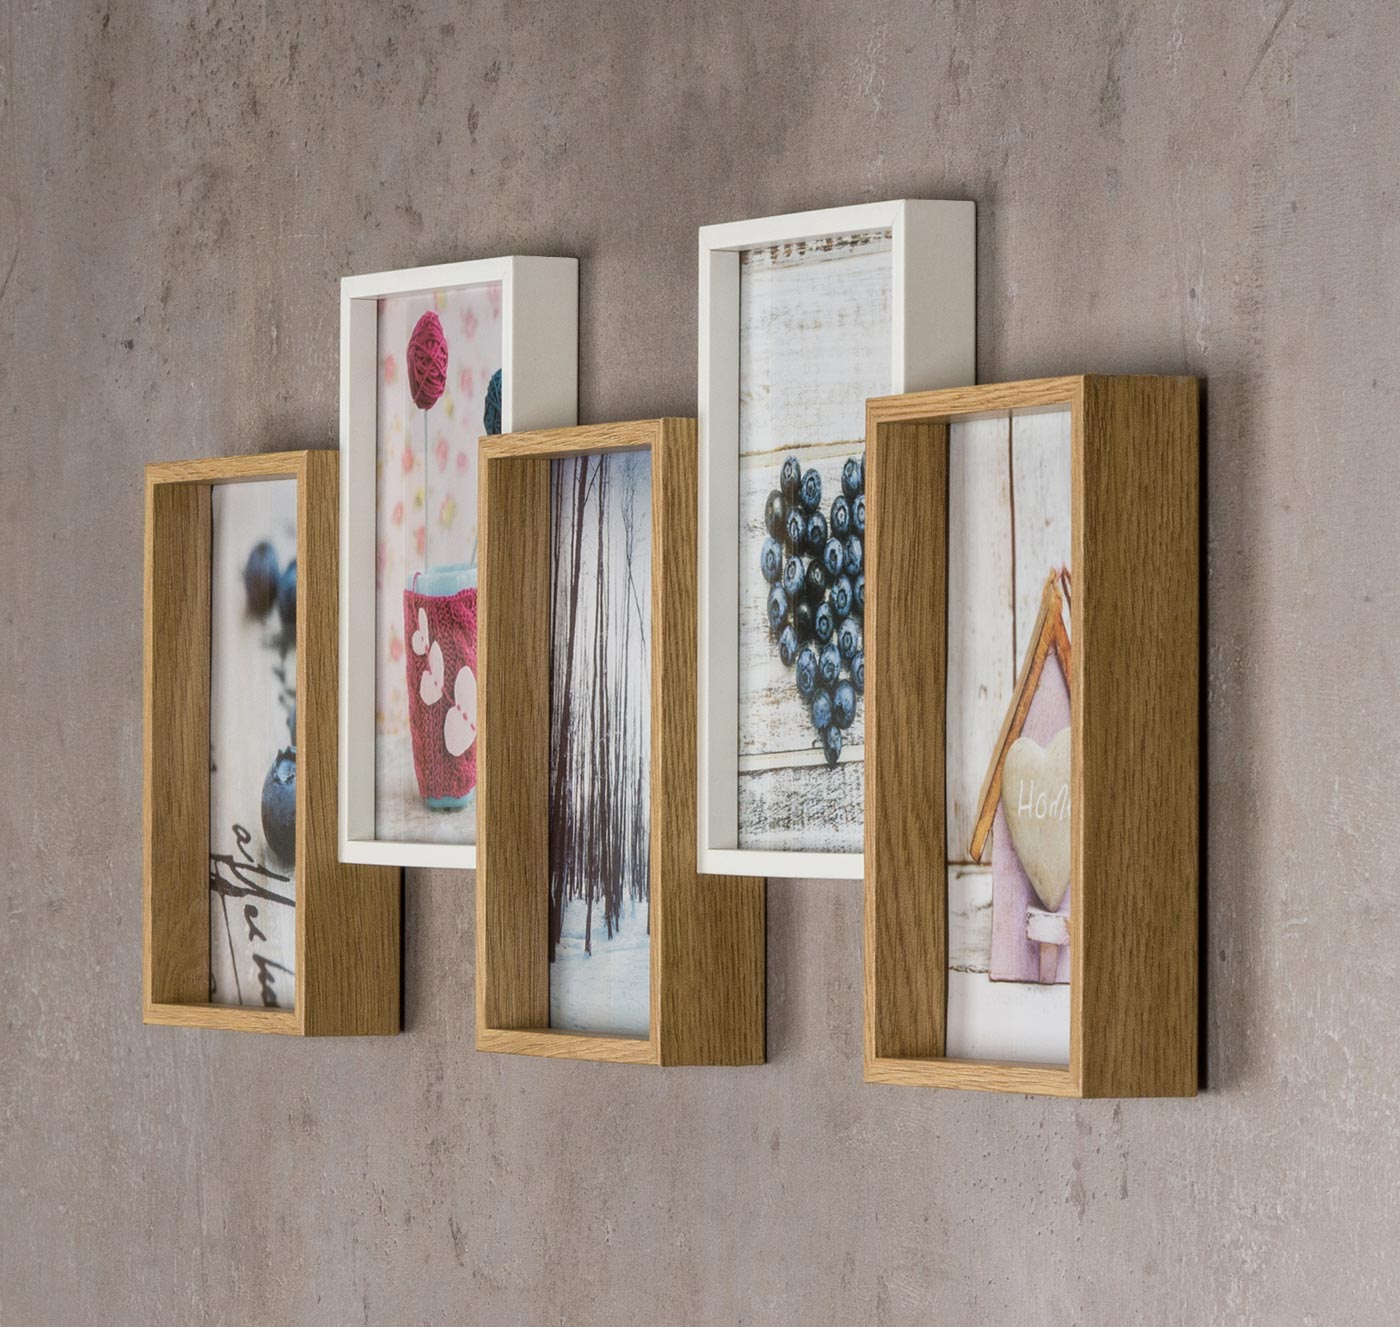 bilderrahmen holz 54 5x21cm eiche wei 5 fotos 10x15 glas. Black Bedroom Furniture Sets. Home Design Ideas